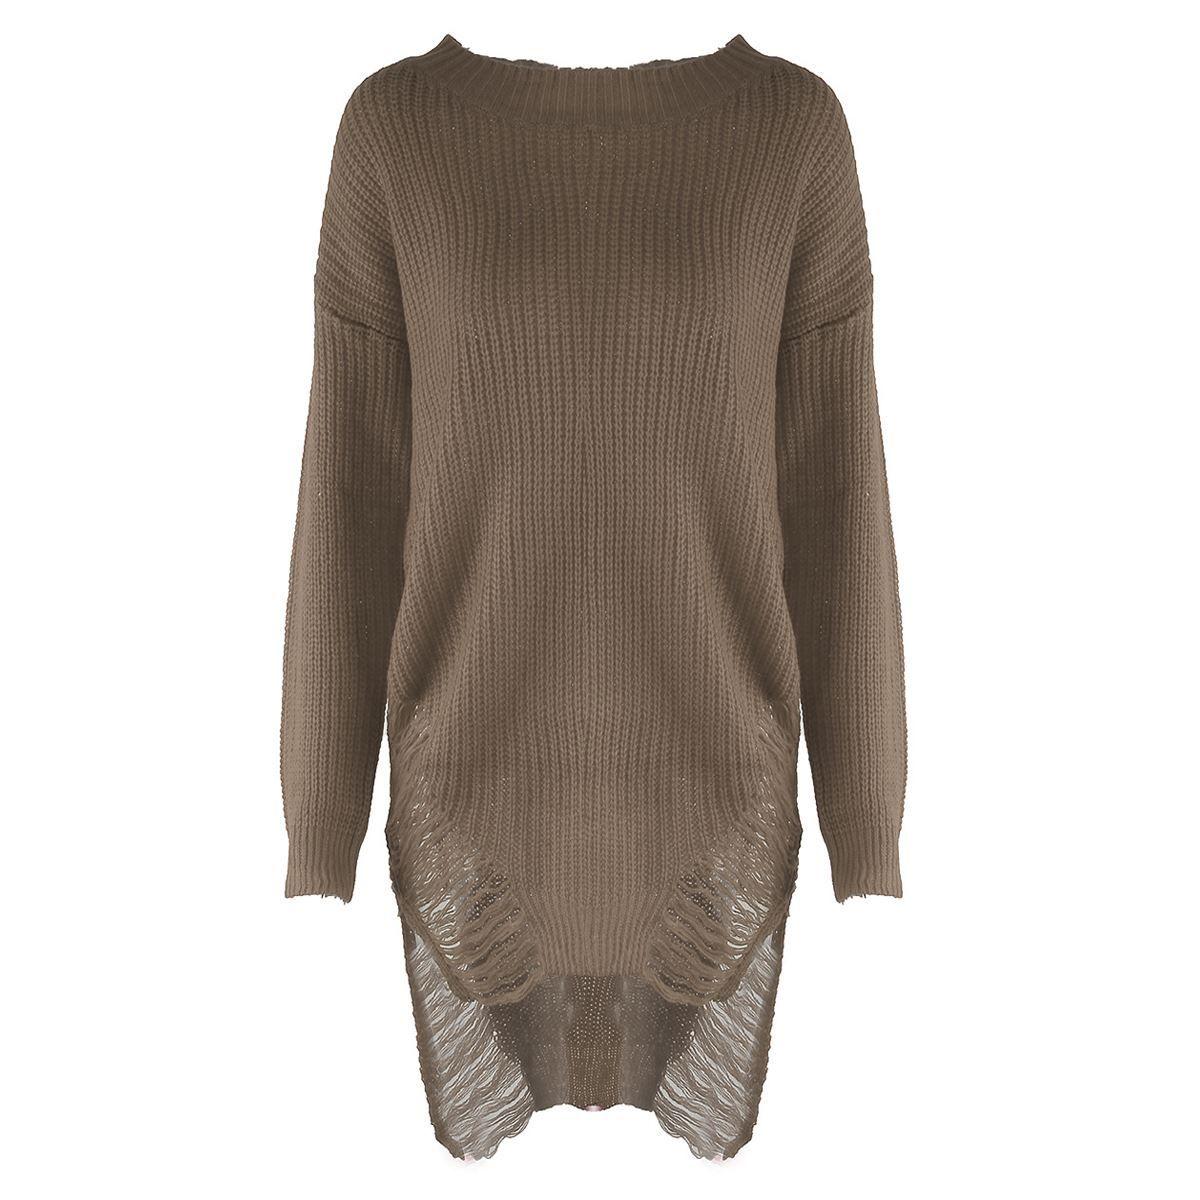 b519bc0743 Autumn Winter Women Sweater Loose Irregular Sweaters Dress O Neck ...